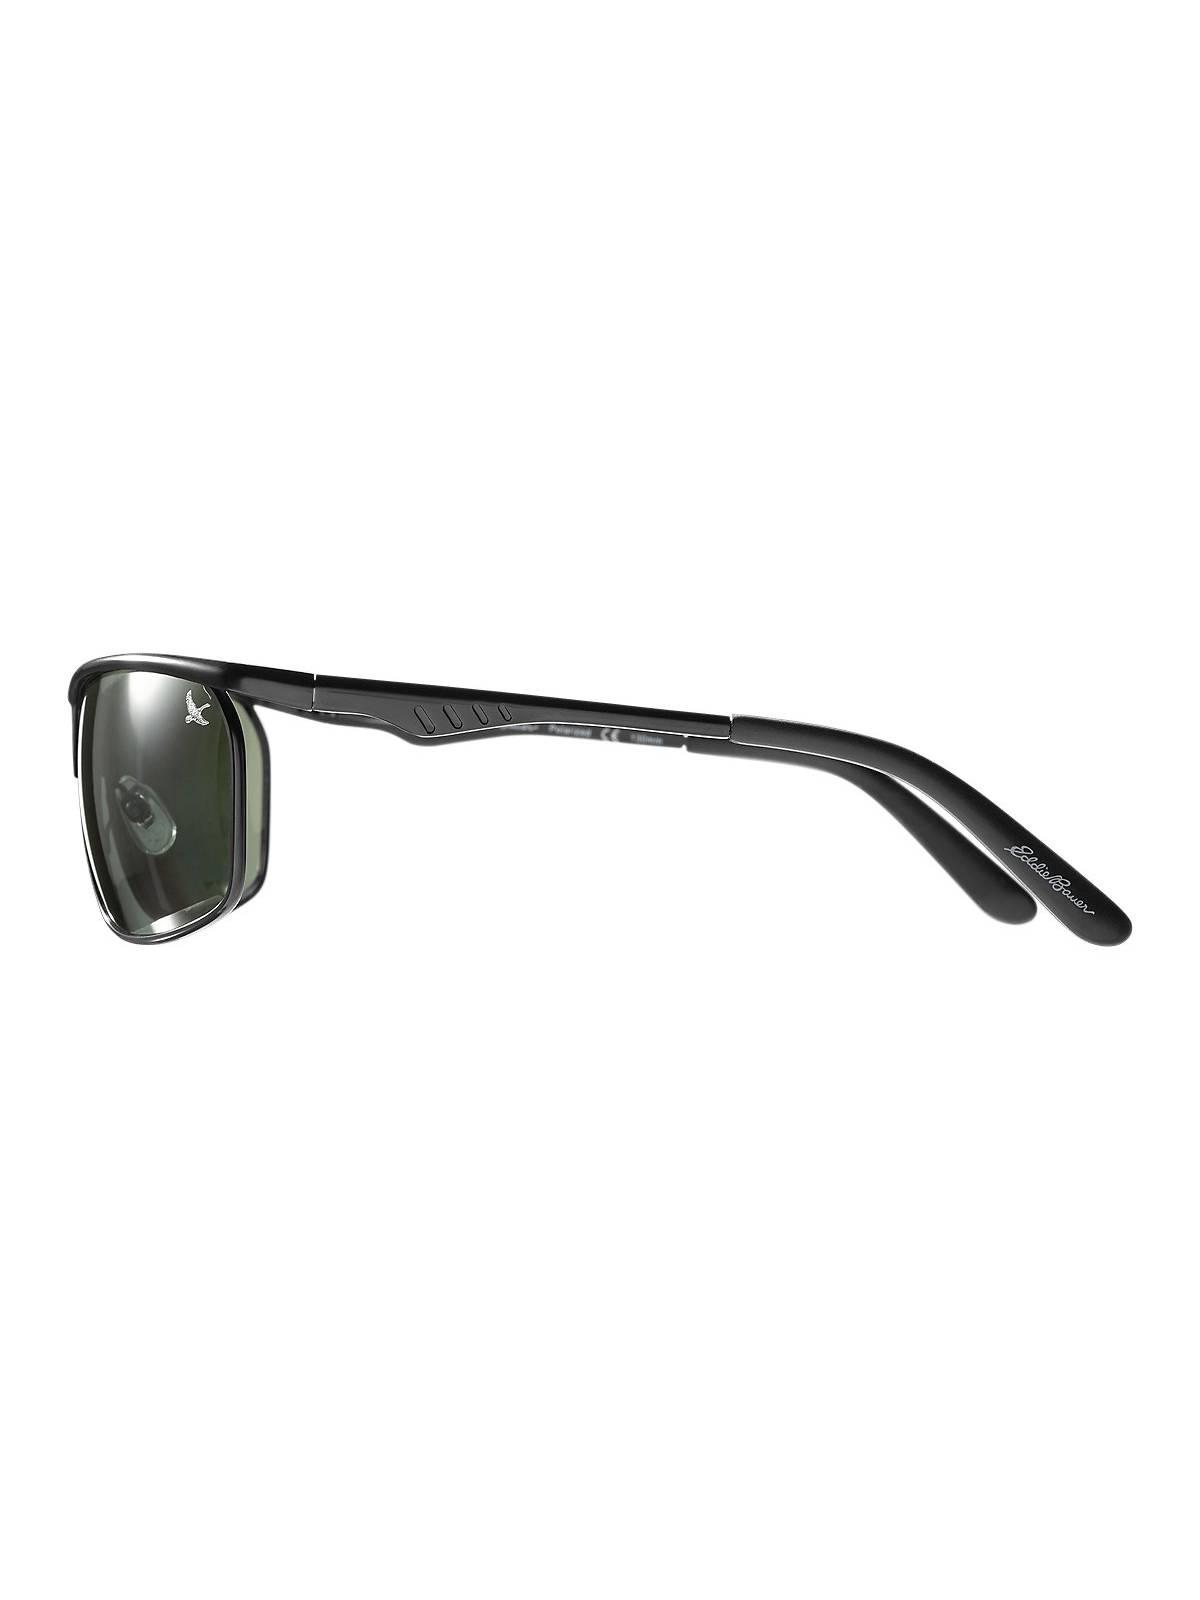 fbe00e5576f9 Eddie-Bauer-Unisex-Adult-Eastlake-Polarized-Sunglasses thumbnail 3